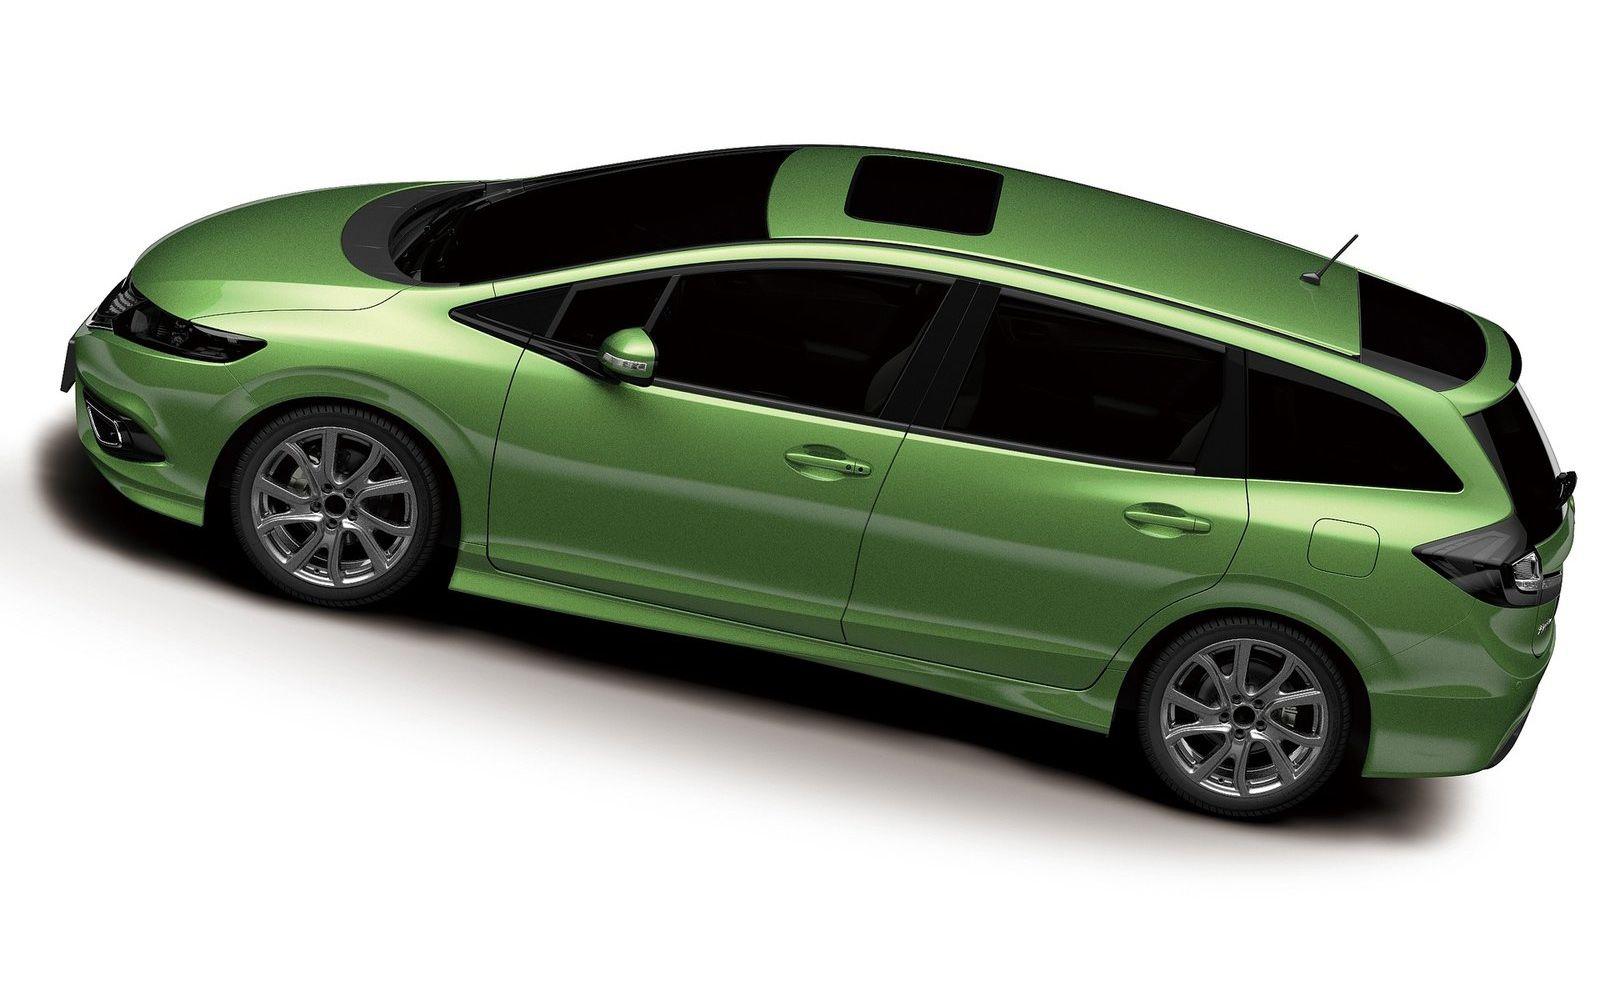 new car releases in australia 2014httpnewcarreviewcom2015hondaodysseydesignandengine2015